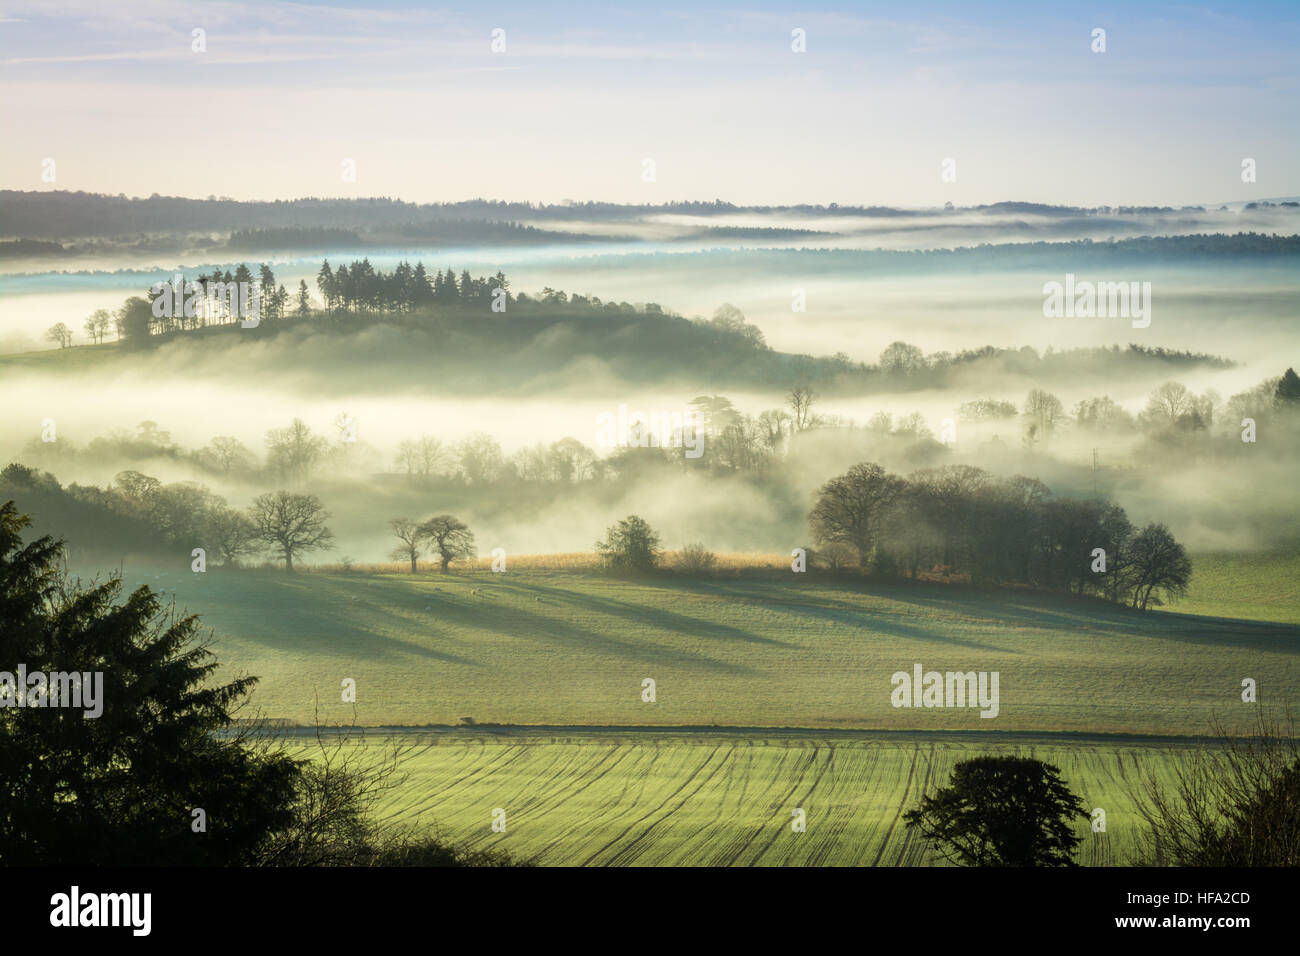 newlands-corner-in-the-surrey-hills-aonb-uk-an-early-morning-misty-HFA2CD.jpg